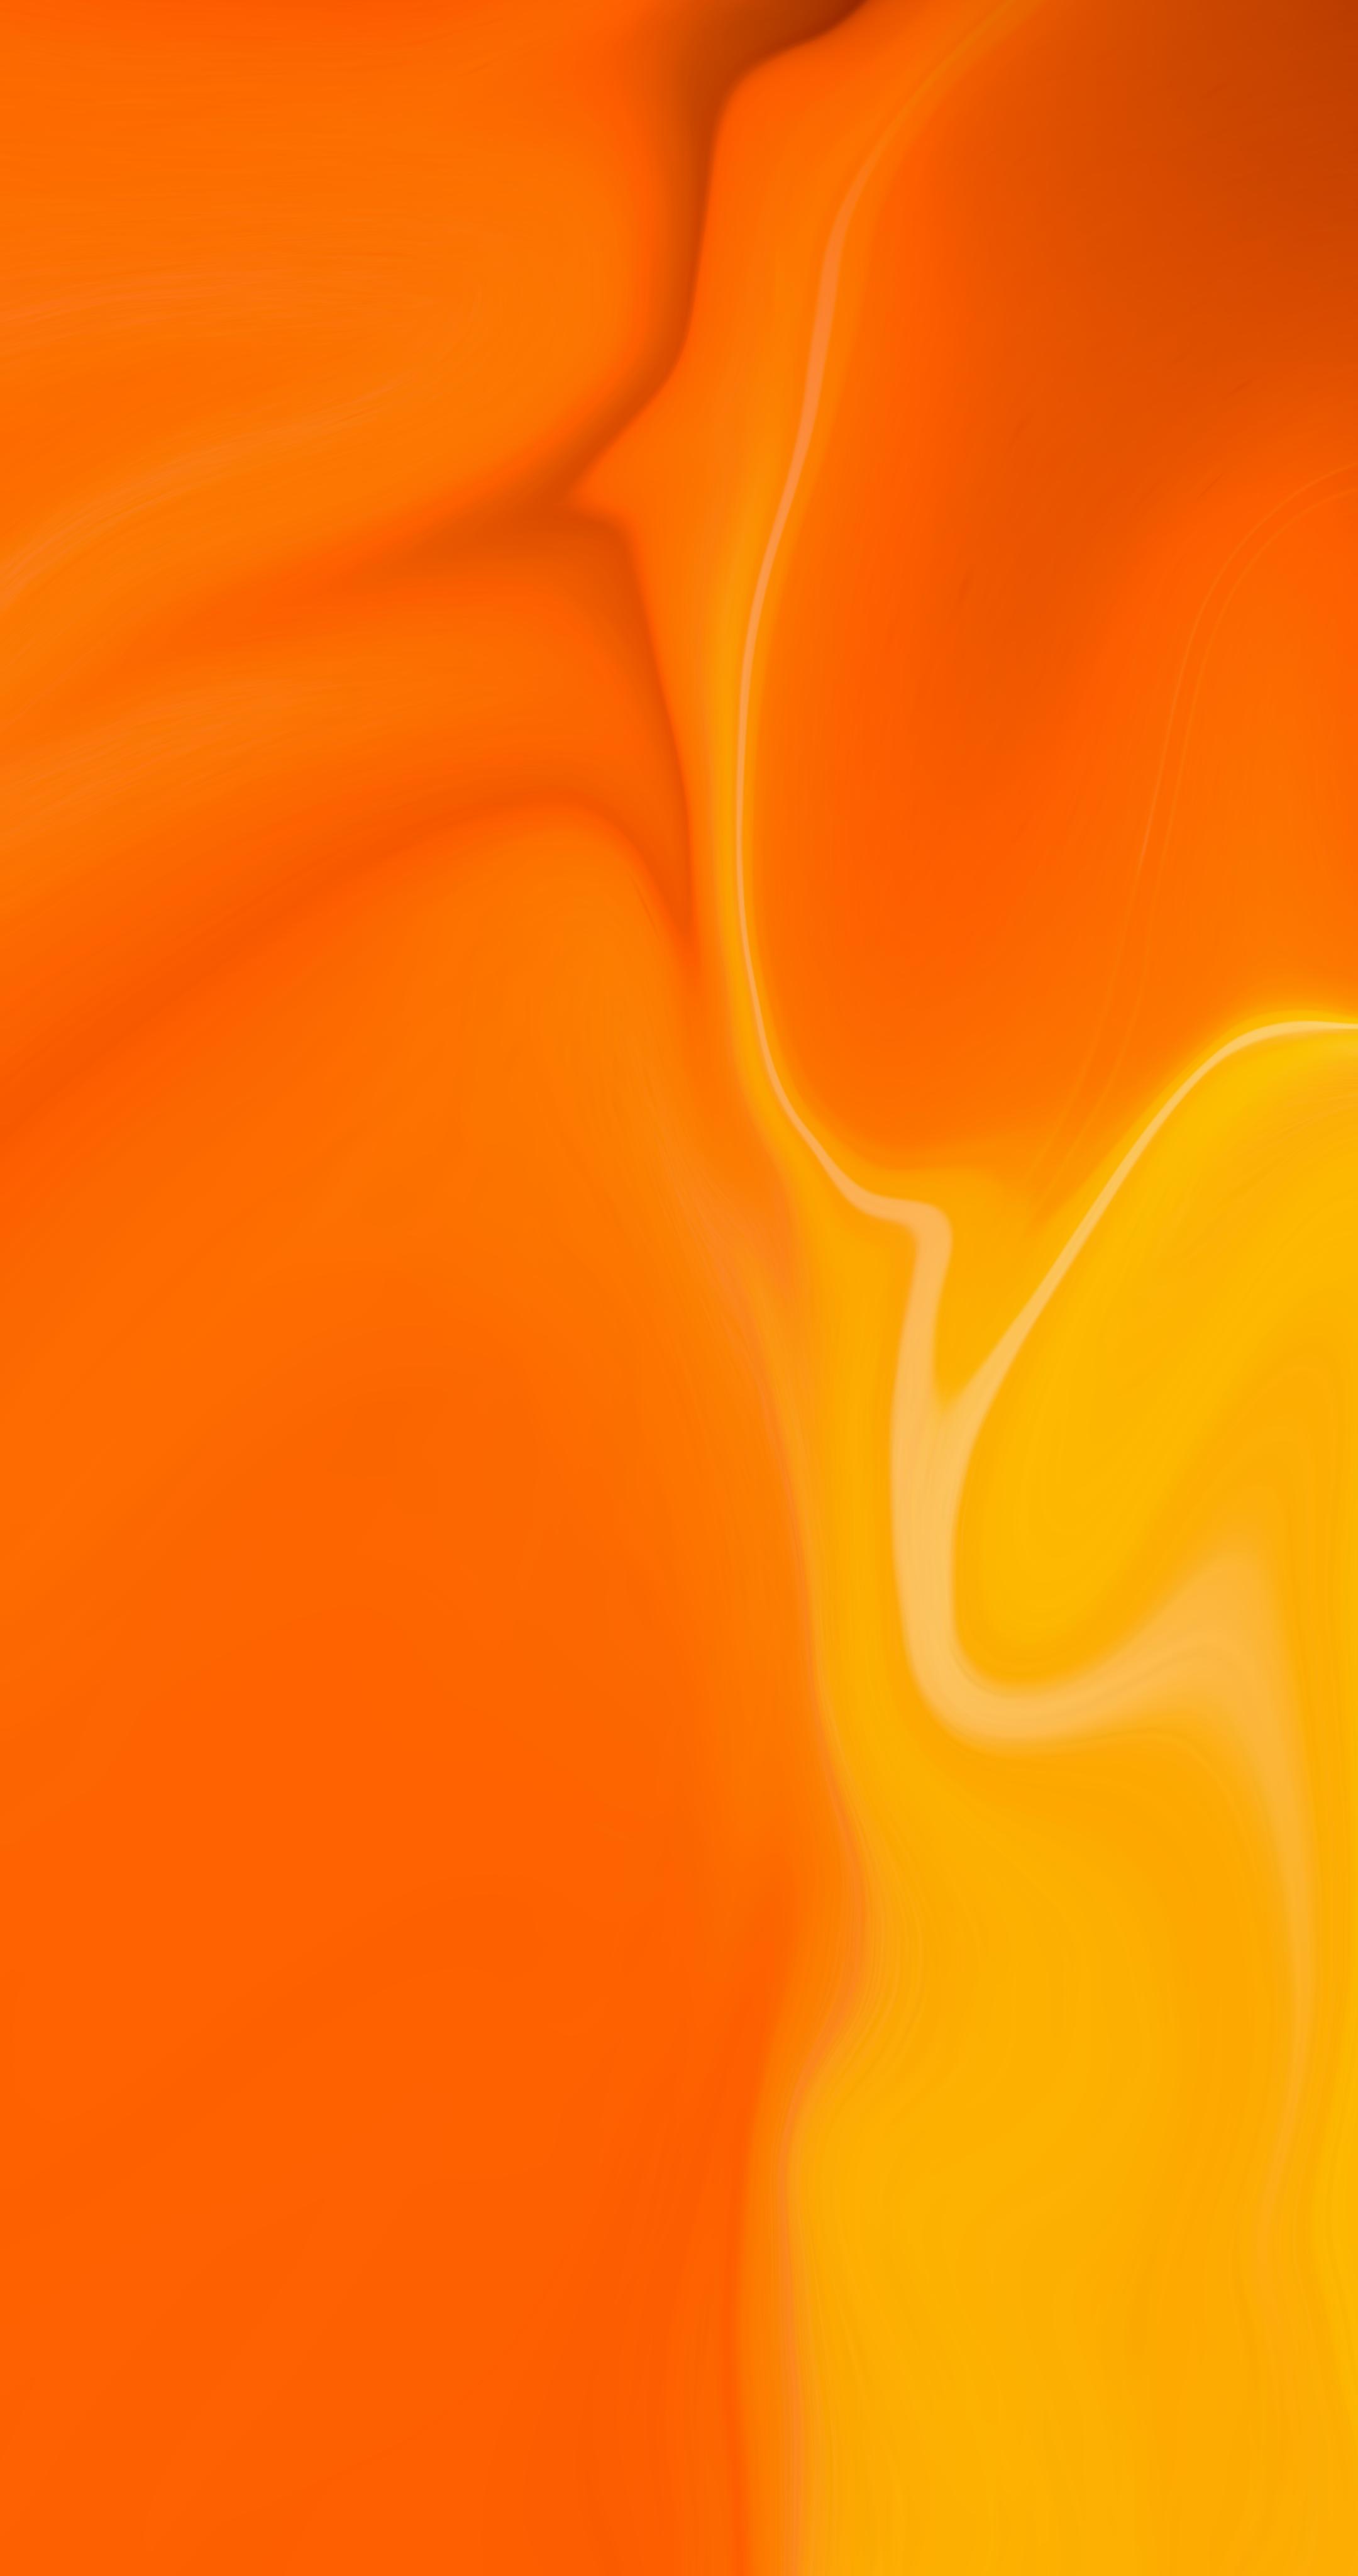 abstract iphone wallpaper idownloadblog saumil8200 Orange